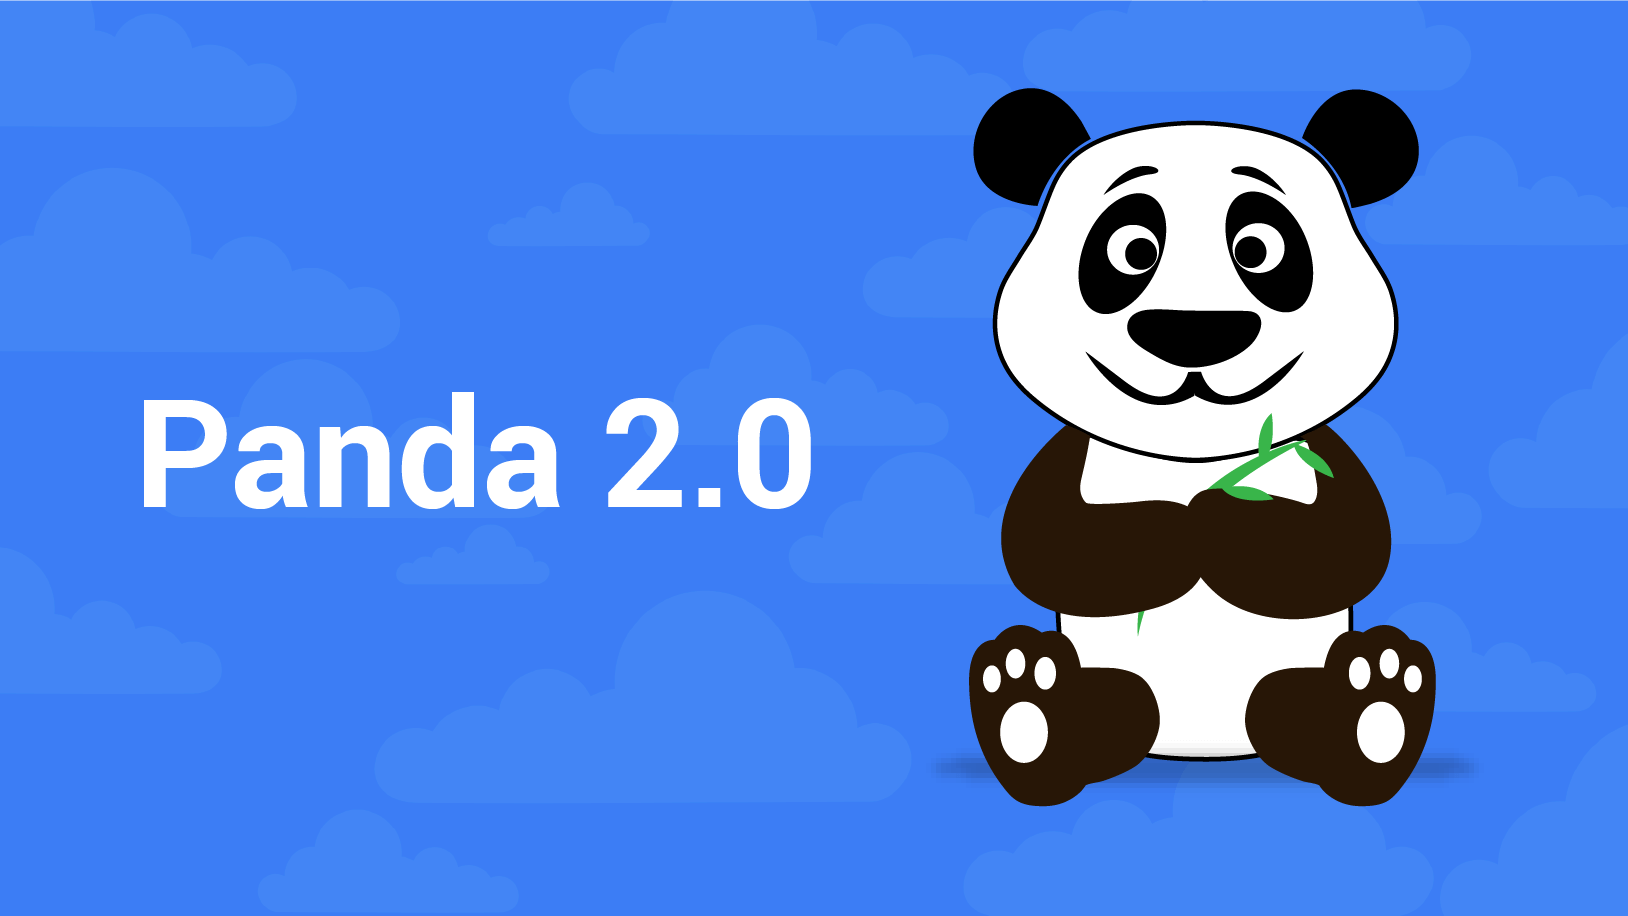 Google Panda 2.0 update